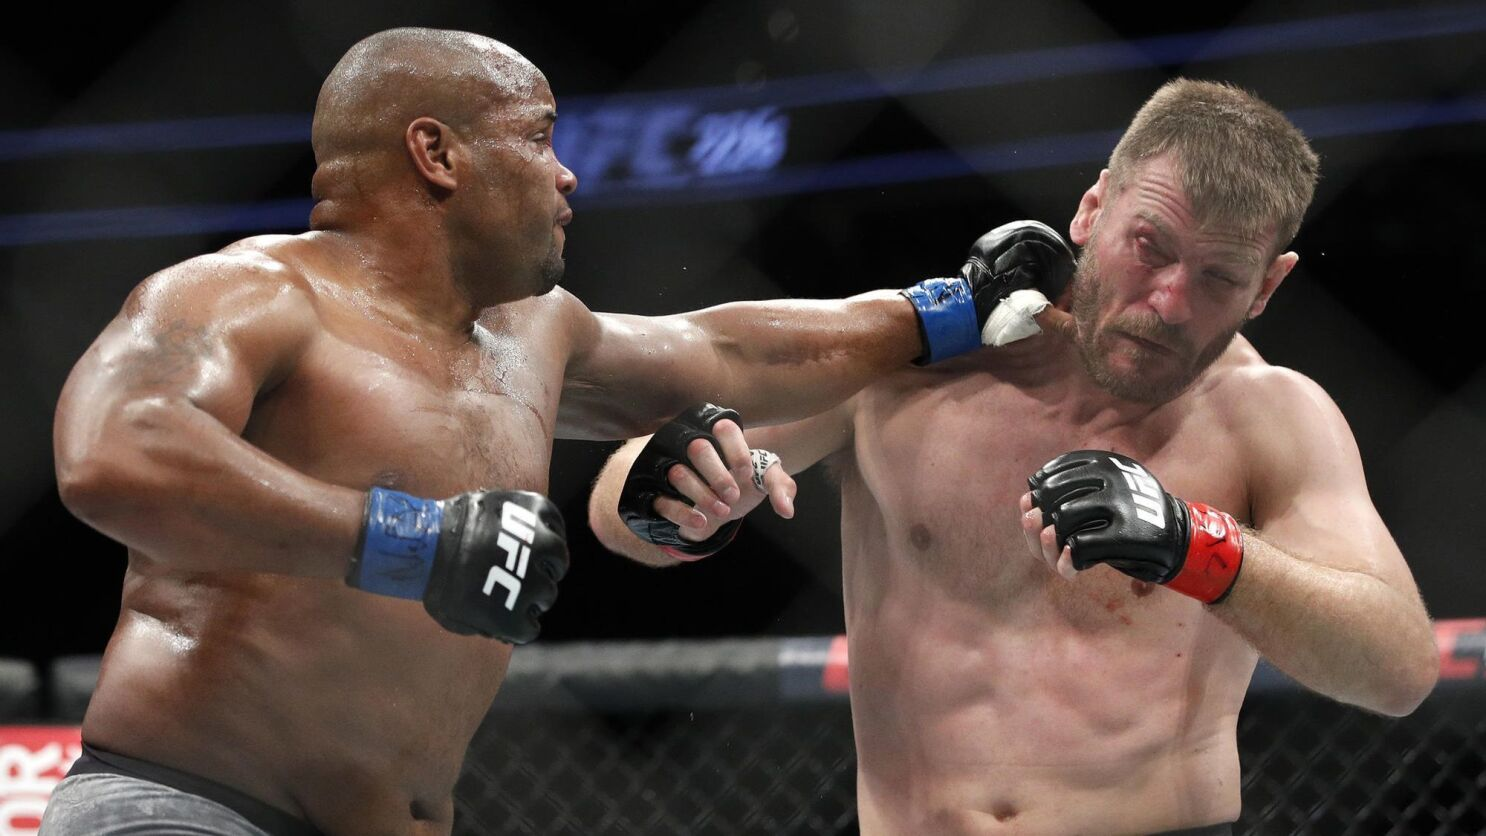 Daniel Cormier vs. Stipe Miocic highlights UFC 241 from Anaheim